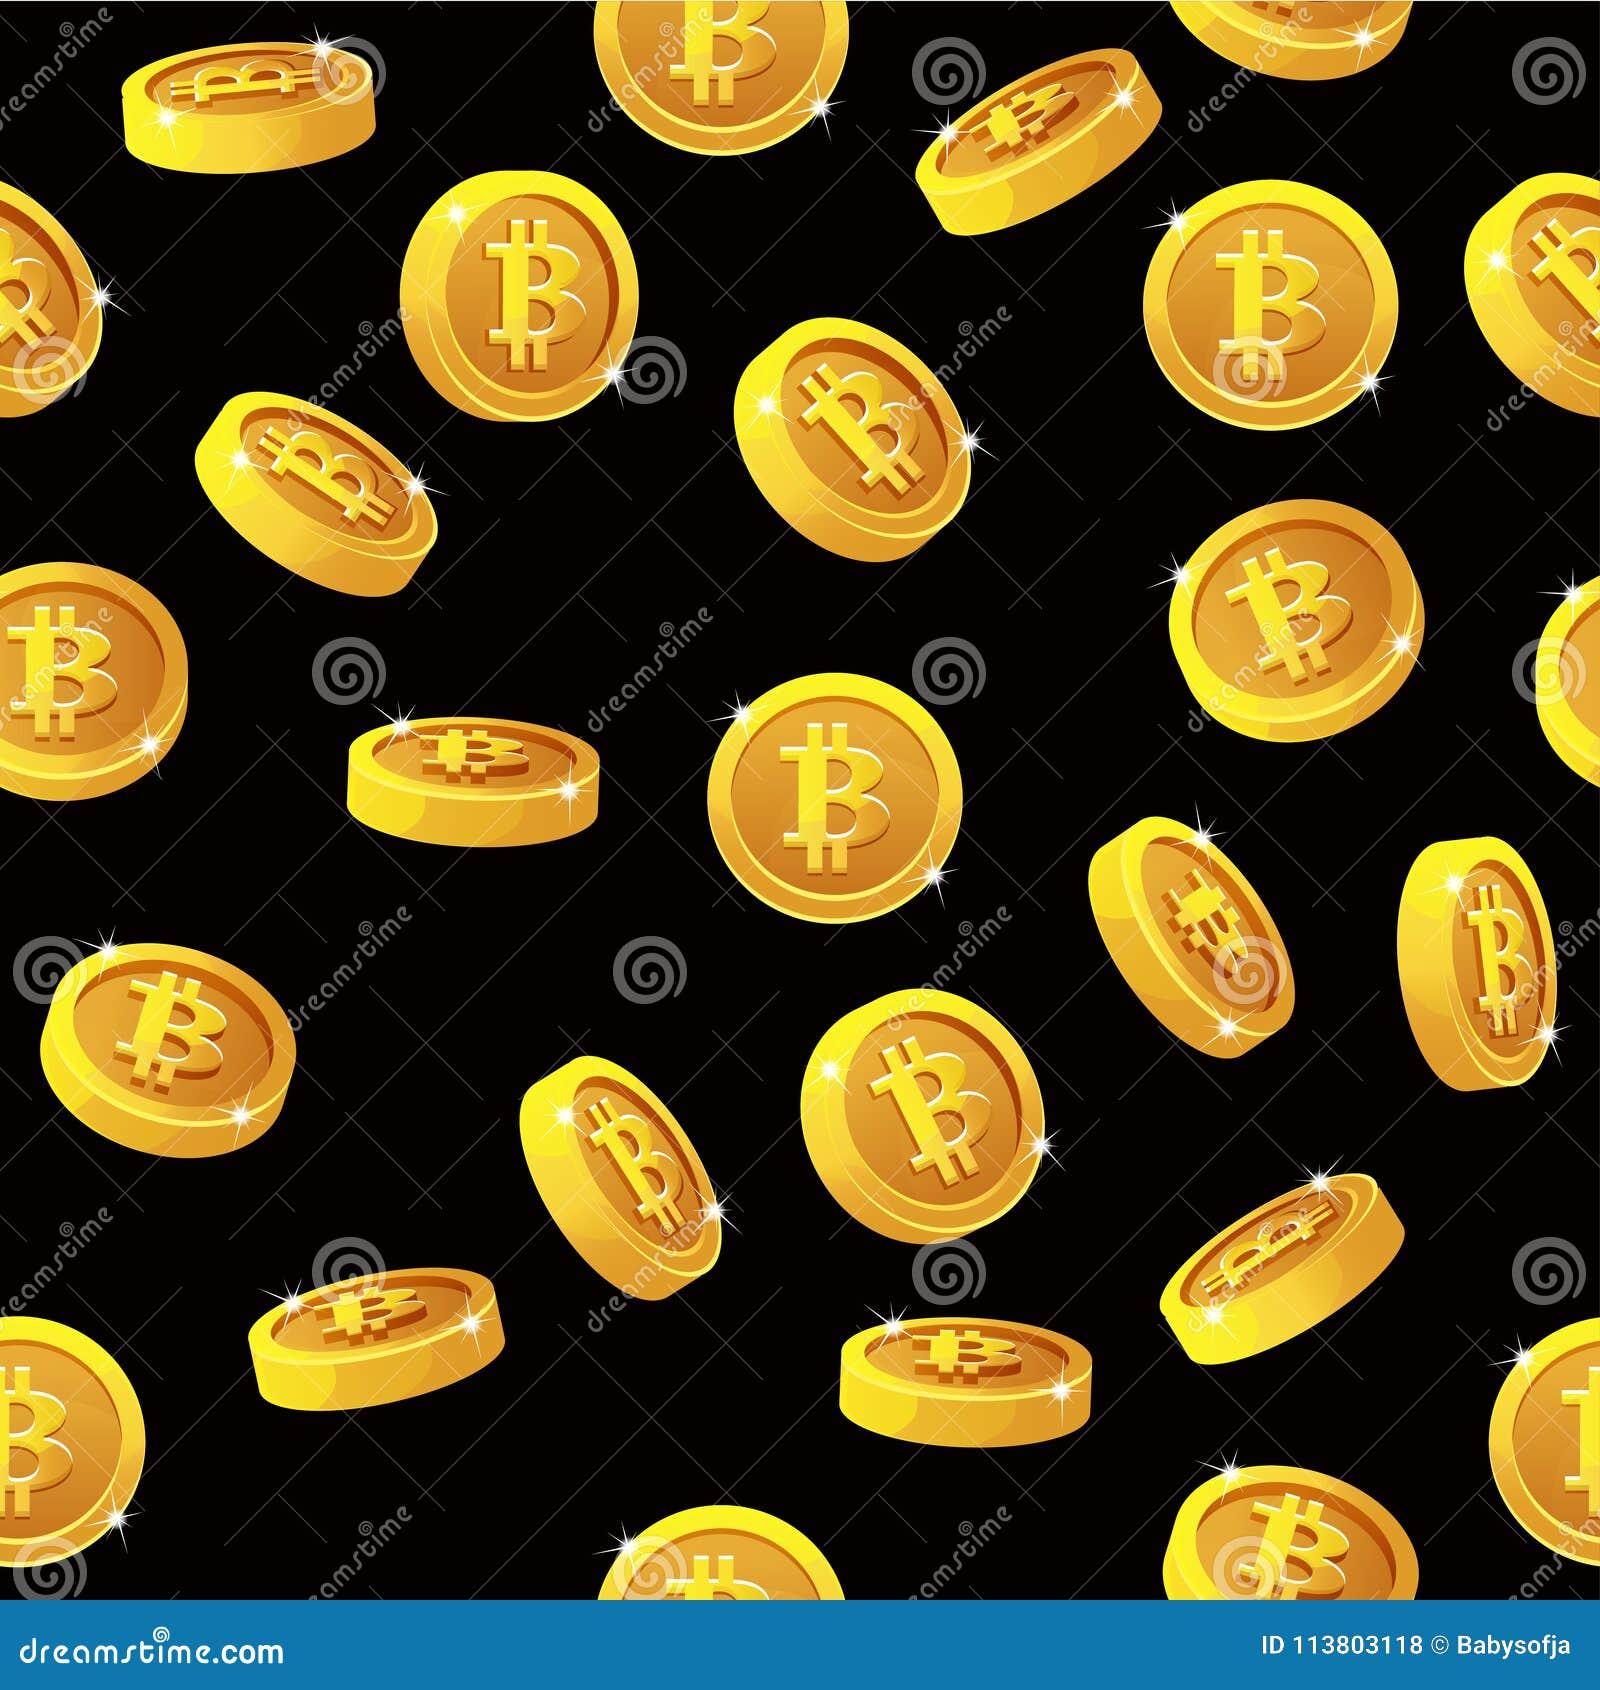 Rotation Bitcoin Coins Seamless Pattern  Digital Internet